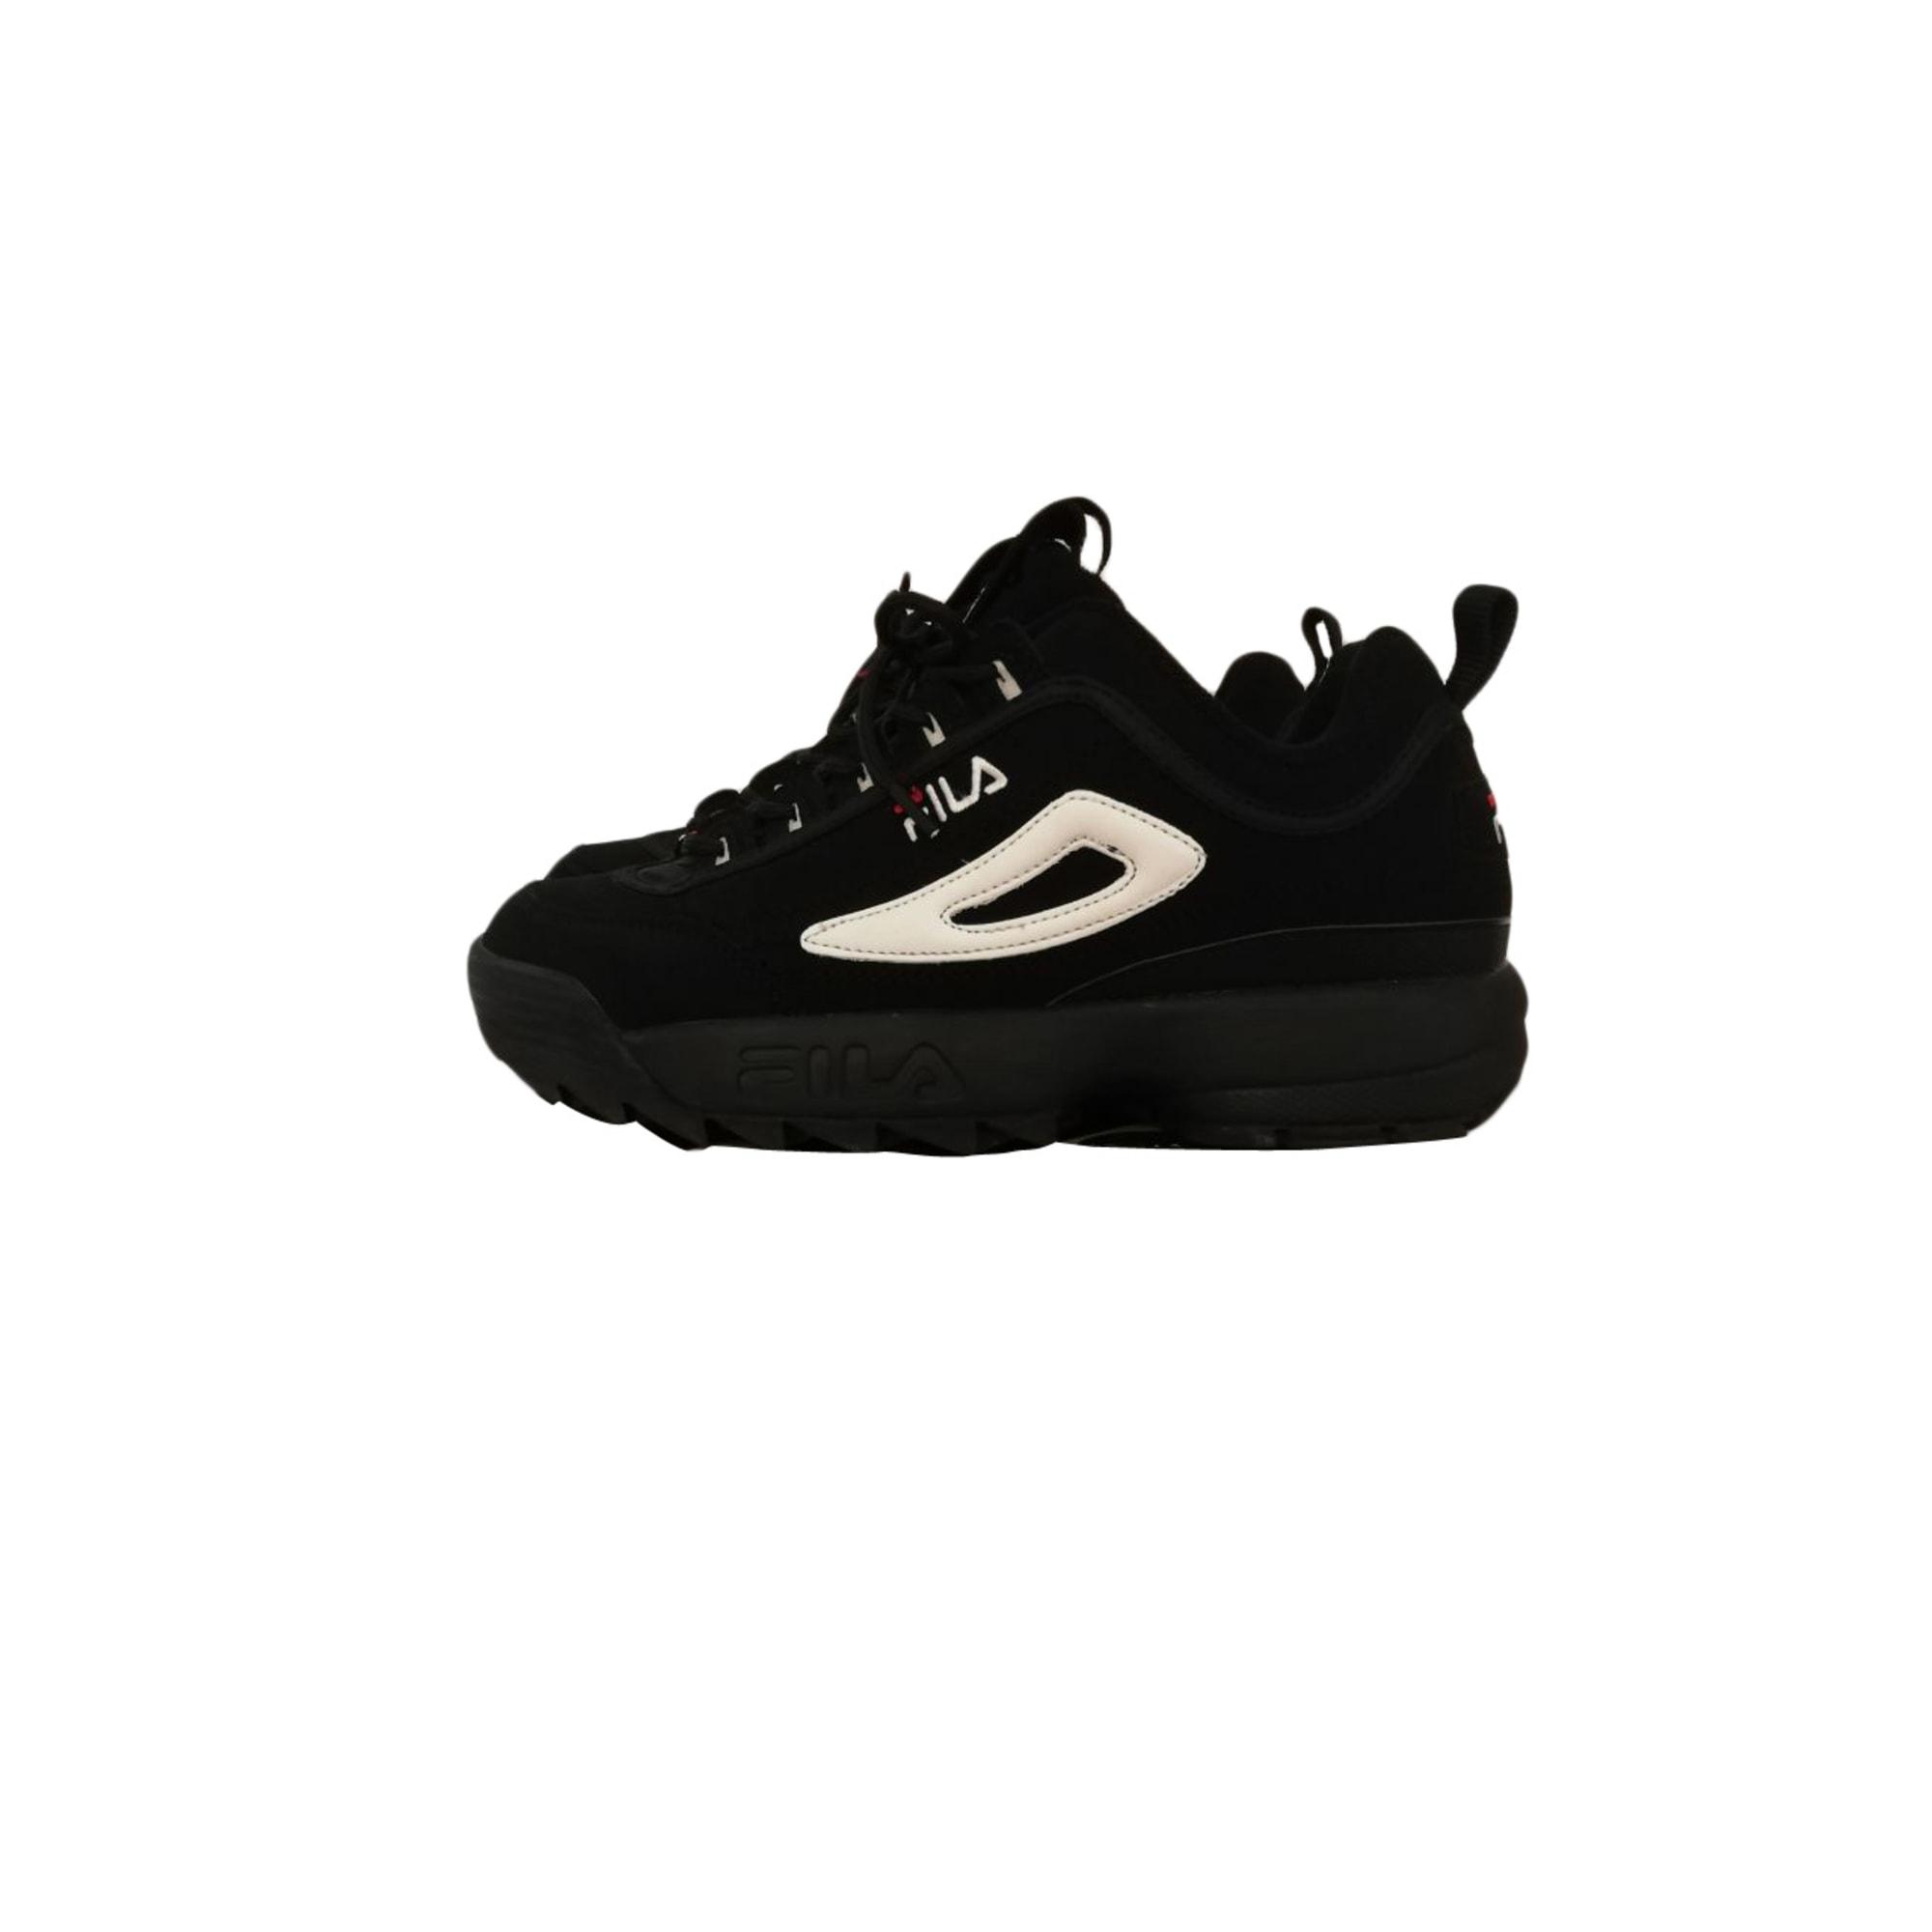 Baskets FILA Noir